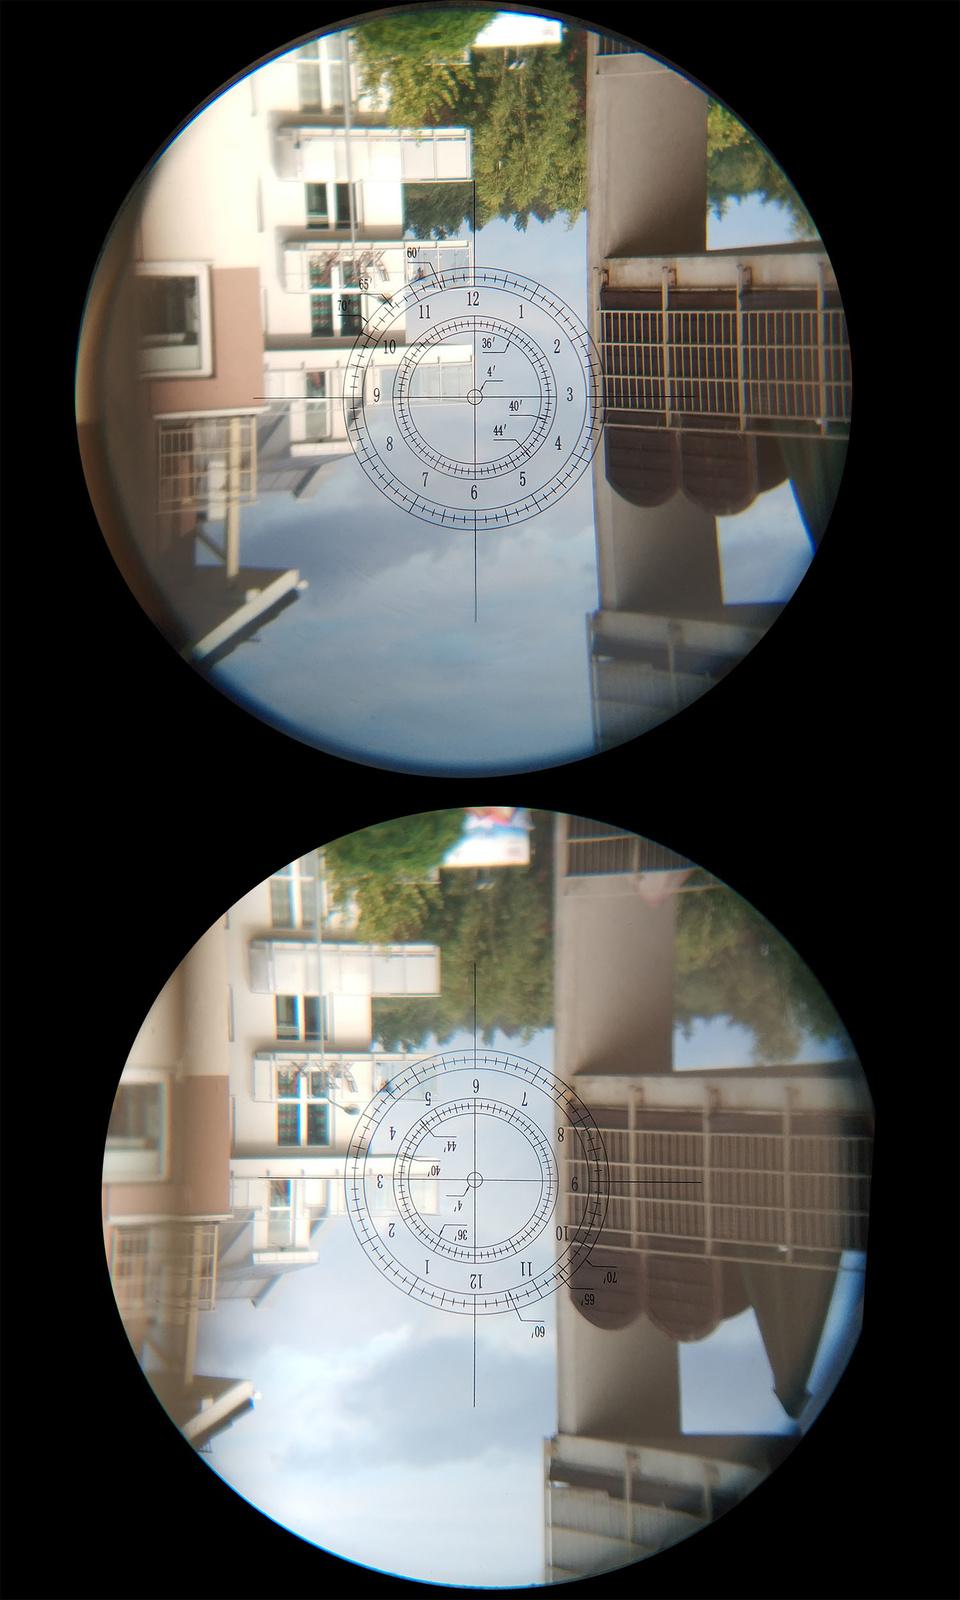 lunetka.thumb.jpg.5b542f193a901263f8ae58ba71e0f4b1.jpg